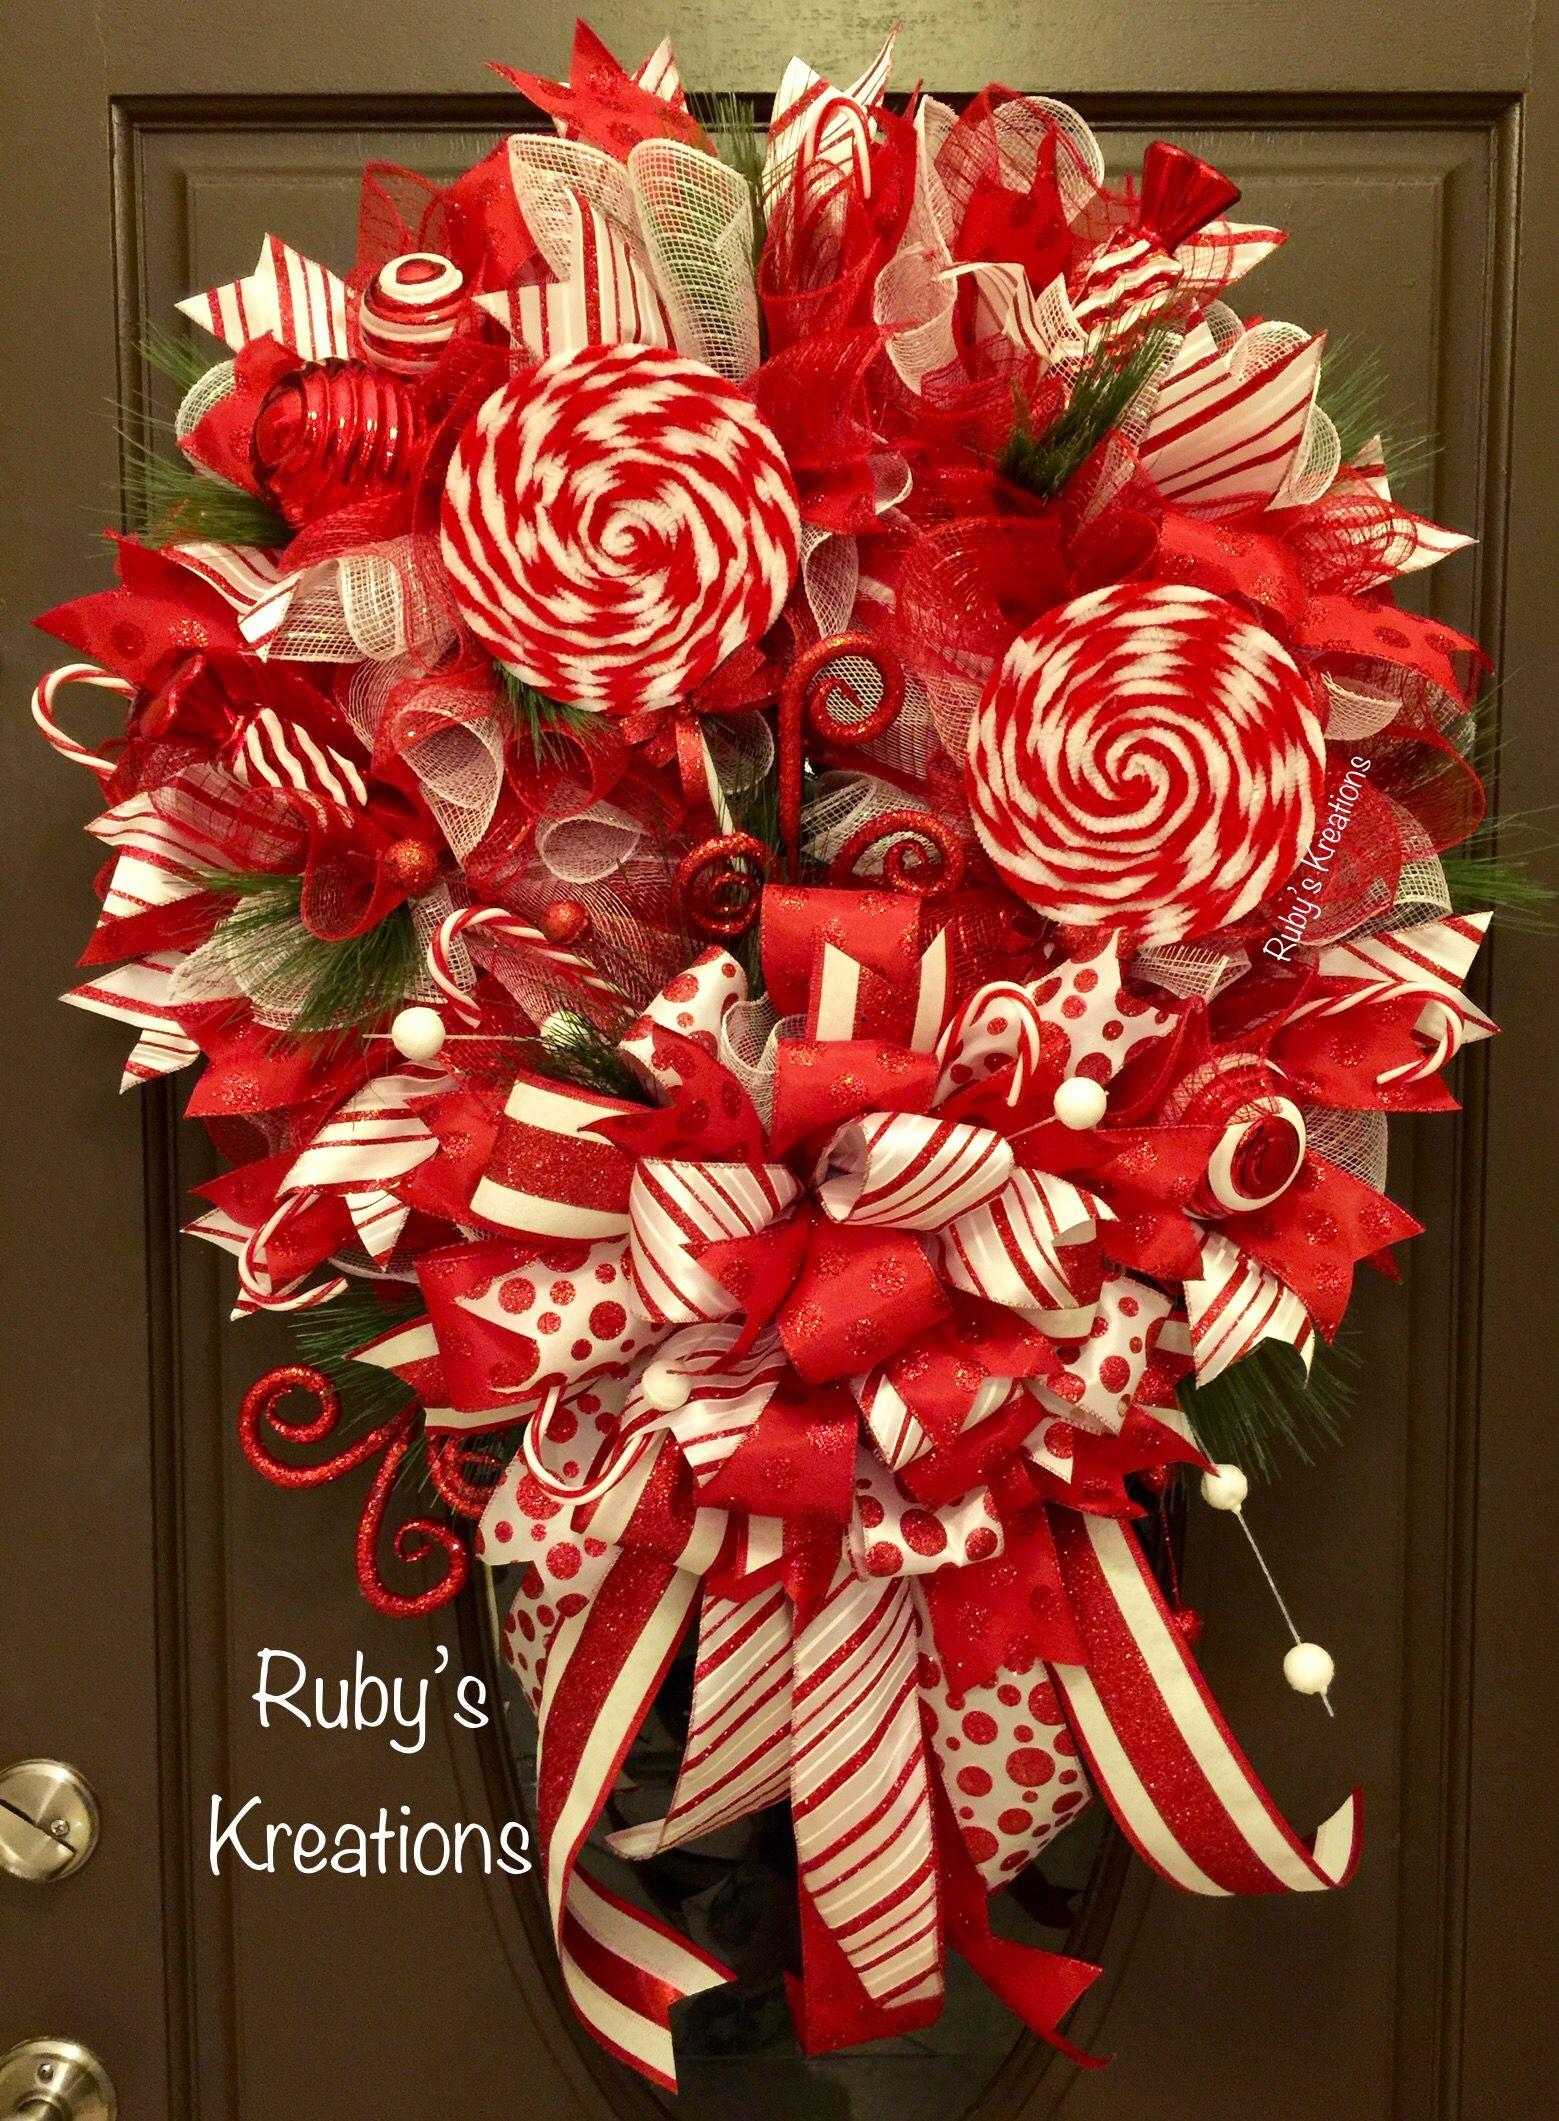 Christmas Wreath Candy Cane Wreath Red & White Wreath